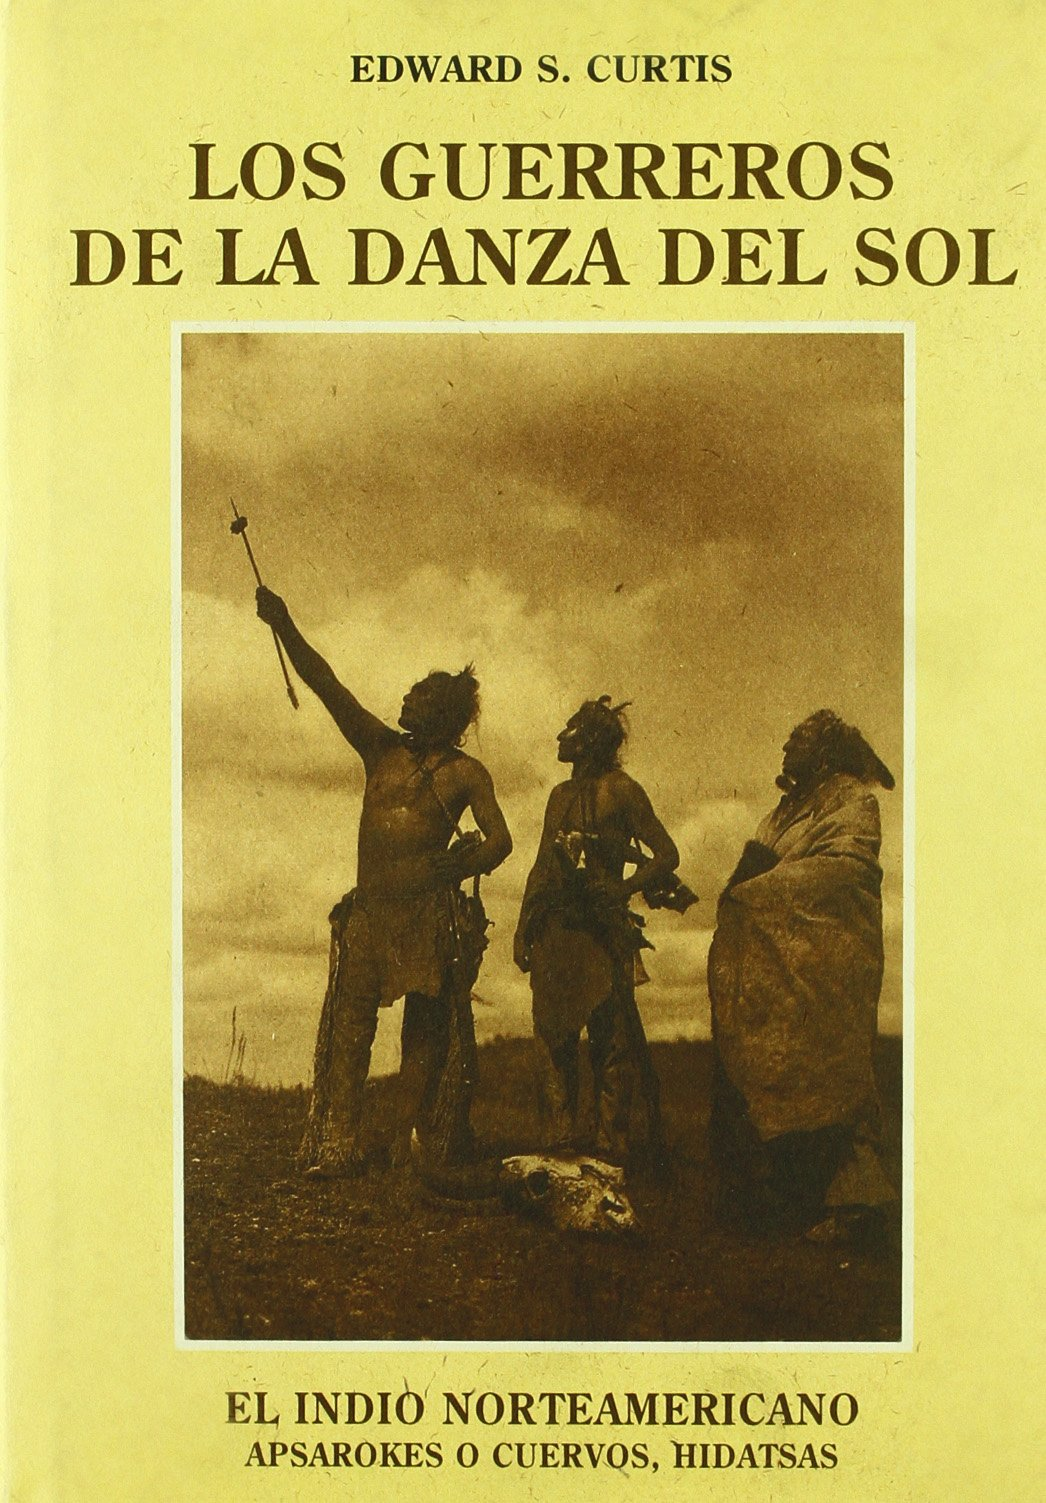 guerreros danza del sol: Edward S. Curtis: 9788476511015 ...